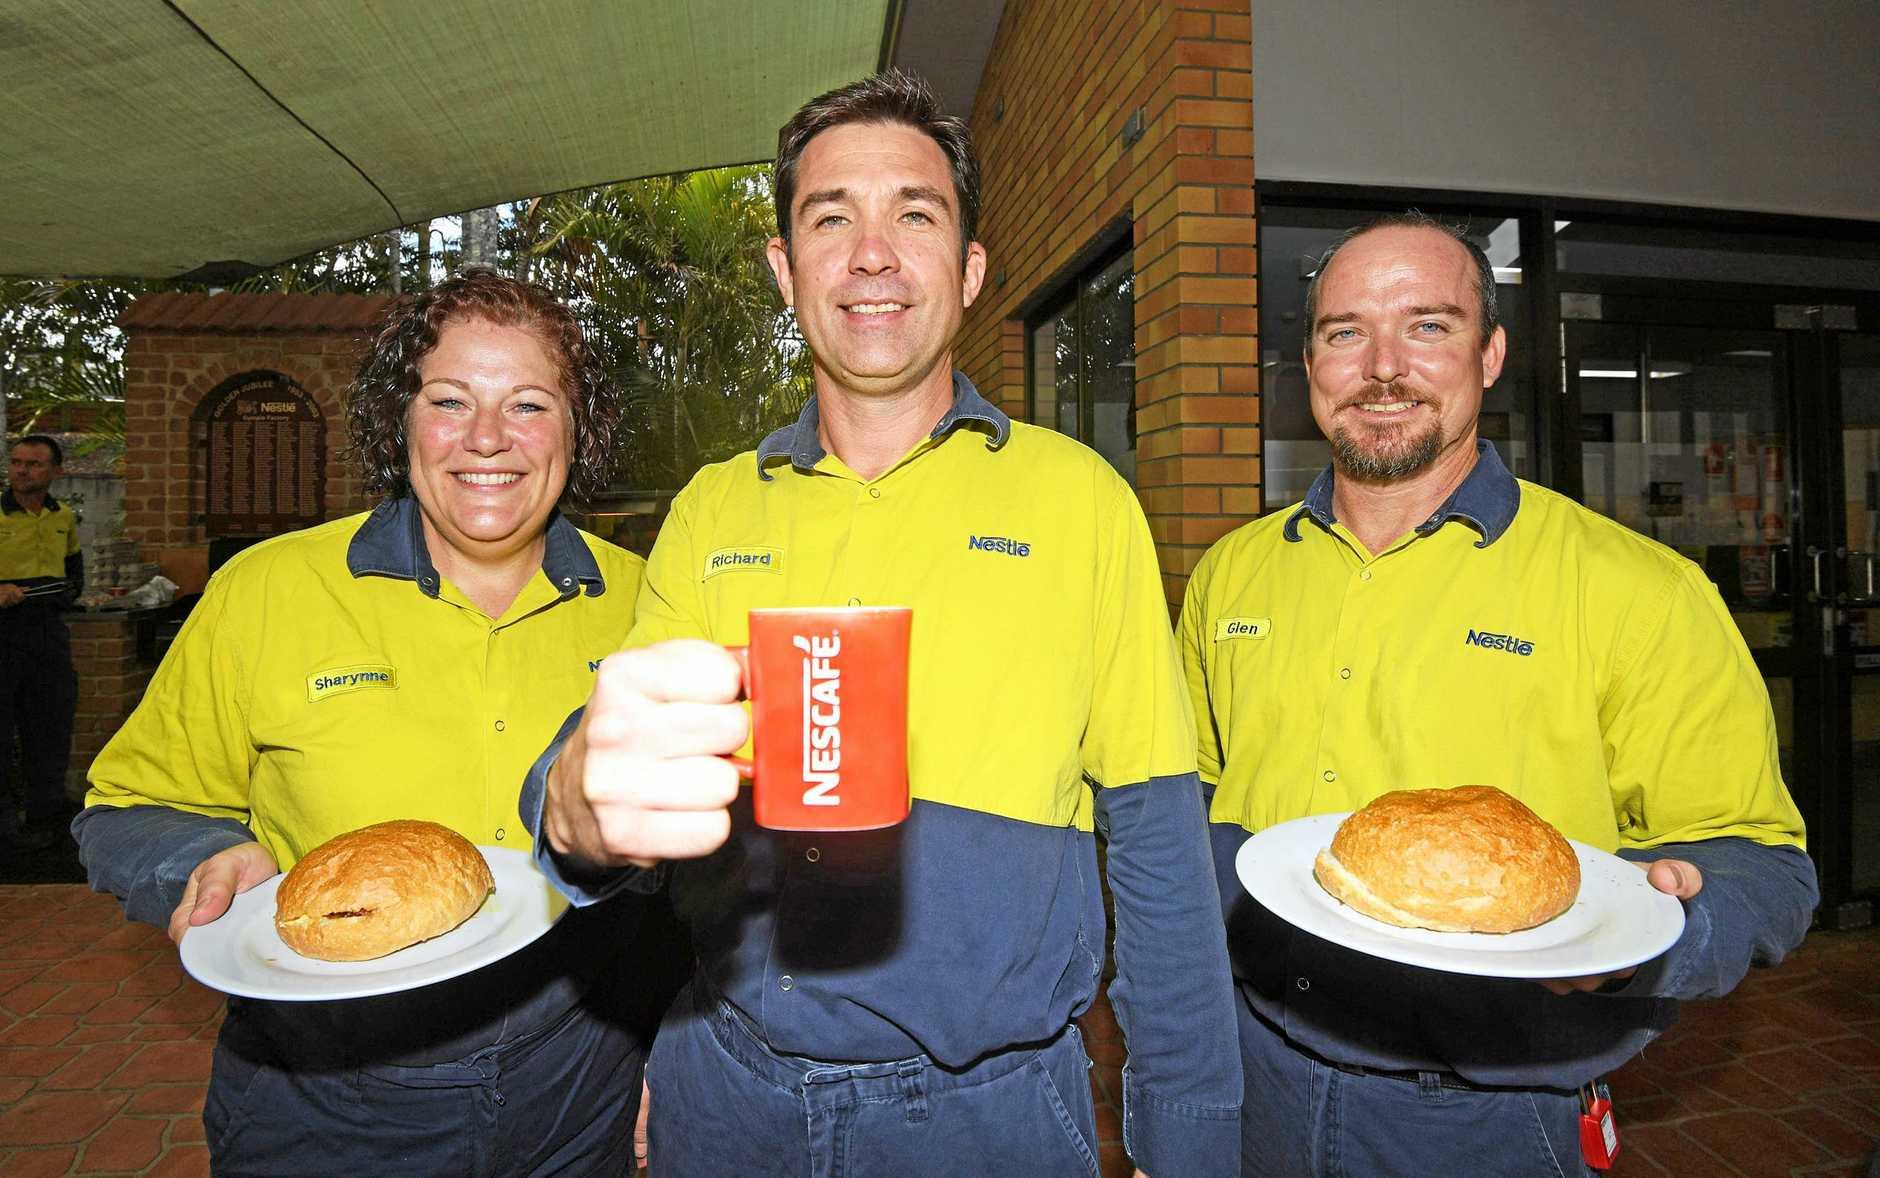 Sharynne Durbidge, with factory manager Richard Jones and Glenn Jones enjoy a decent pre-Australia Day breakfast.